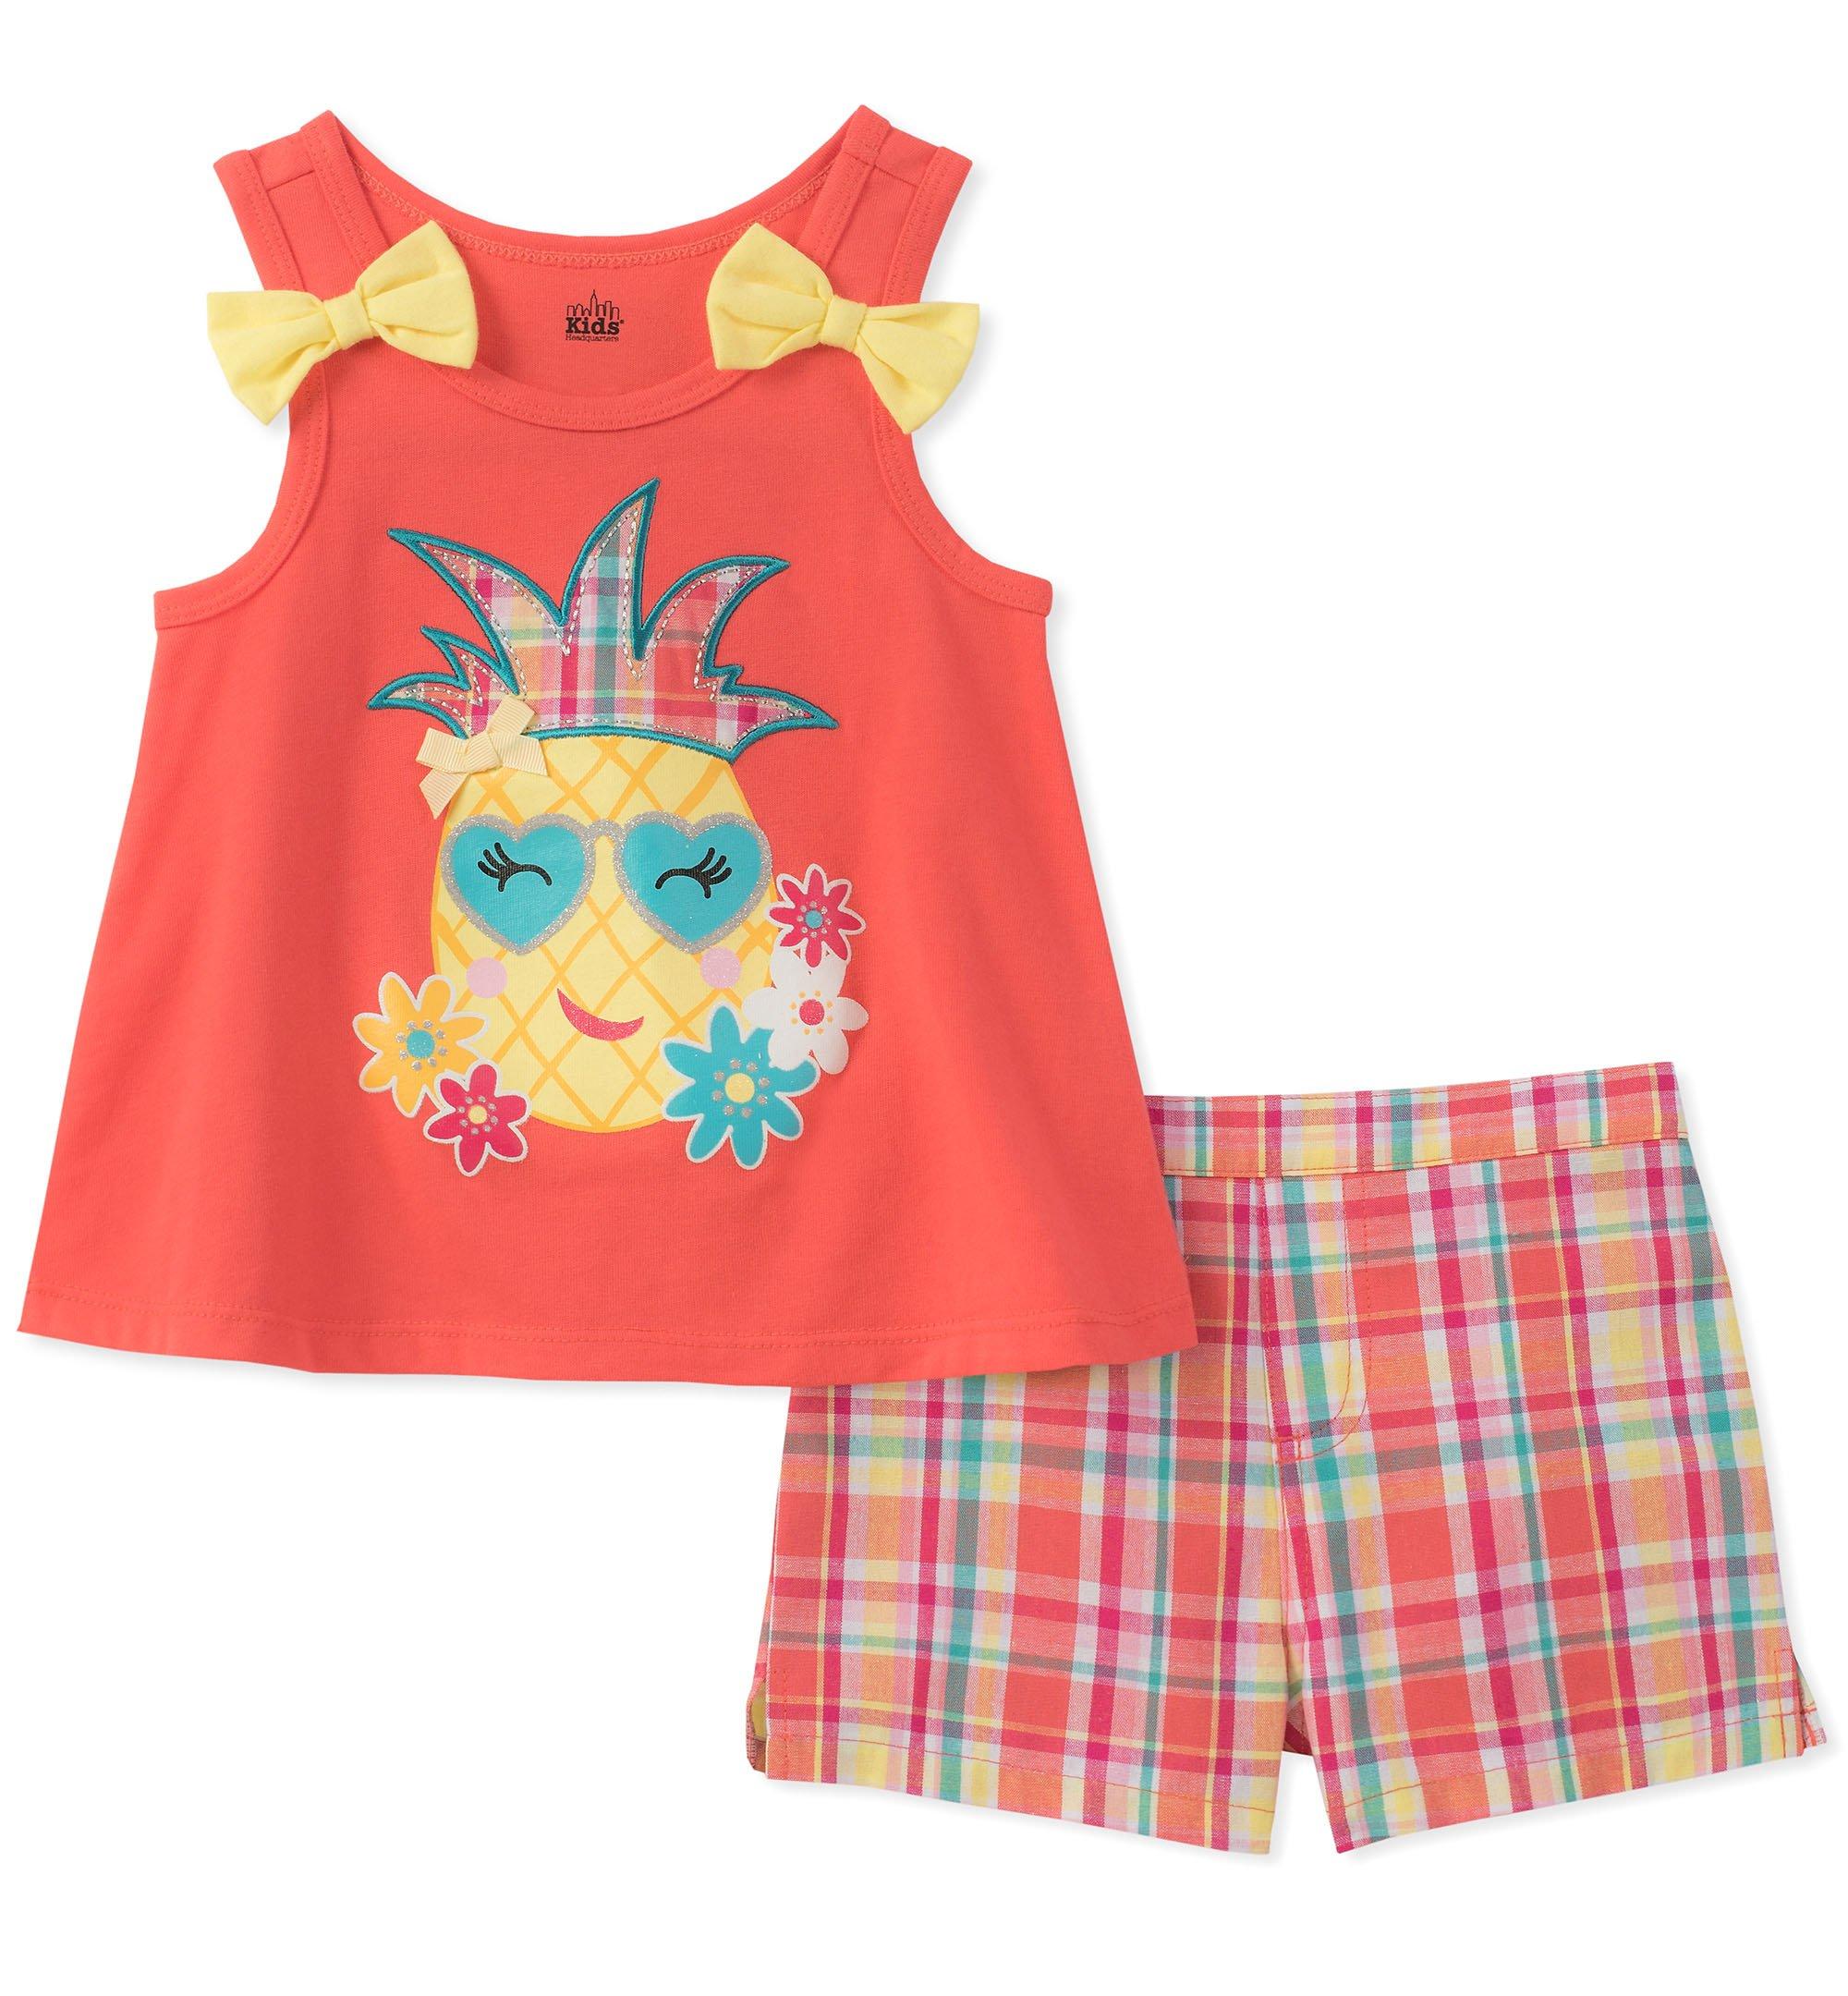 Kids Headquarters Toddler Girls' 2 Pieces Shorts Set, Orange, 4T